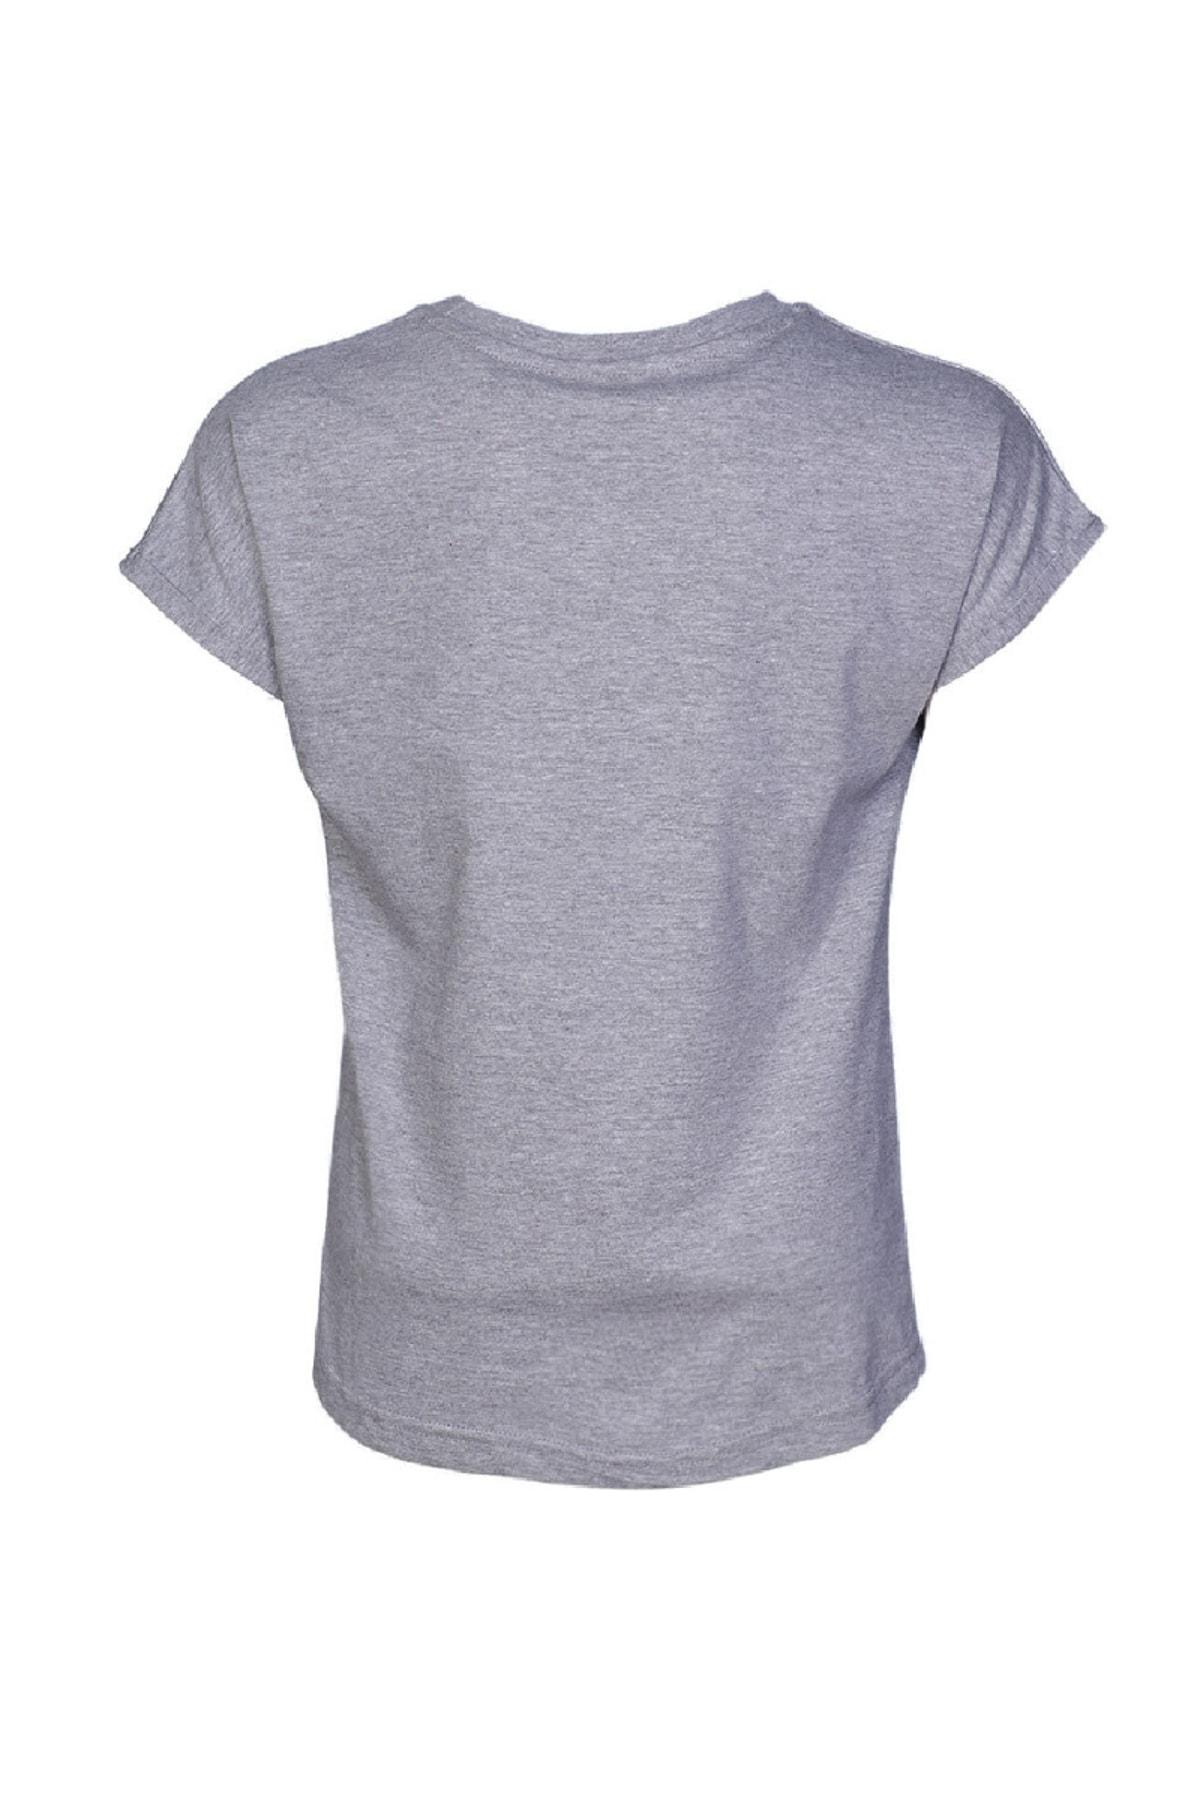 HUMMEL KIDS HMLCARLINA   T-SHIRT S/S GRI MELANJ Kız Çocuk T-Shirt 100581136 2